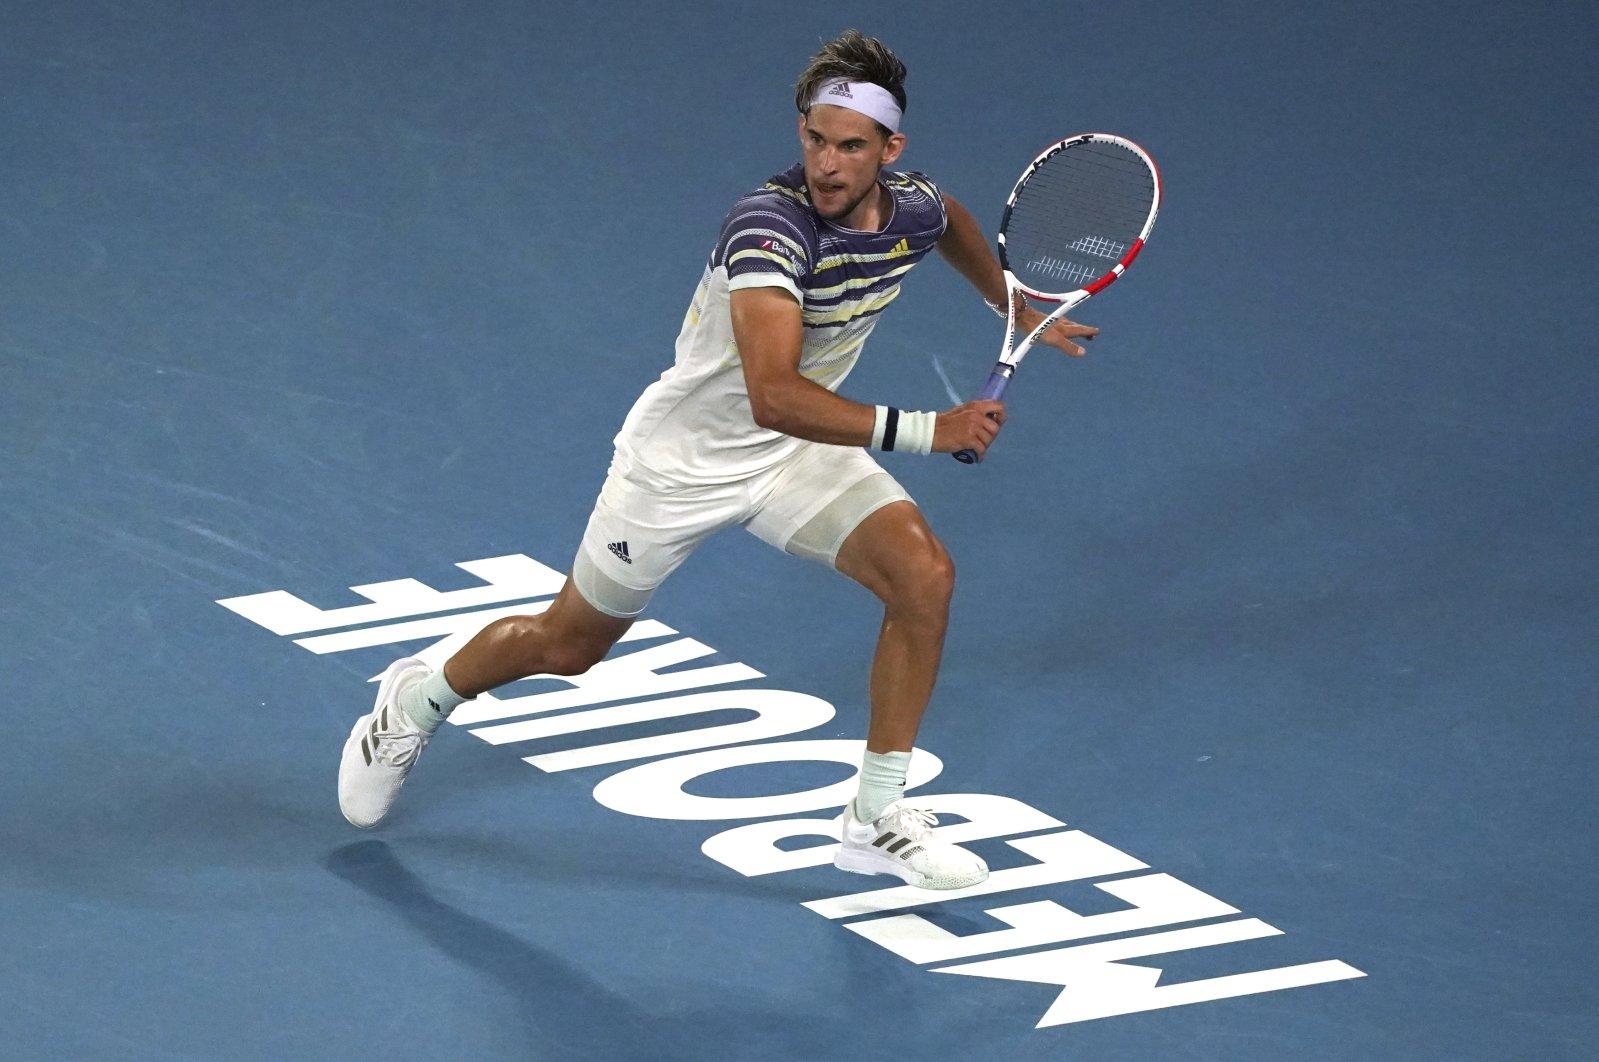 Dominic Thiem runs to play a shot to Rafael Nadal during a quarterfinal match at the Australian Open tennis championship in Melbourne, Australia, Jan. 29, 2020. (AP Photo)